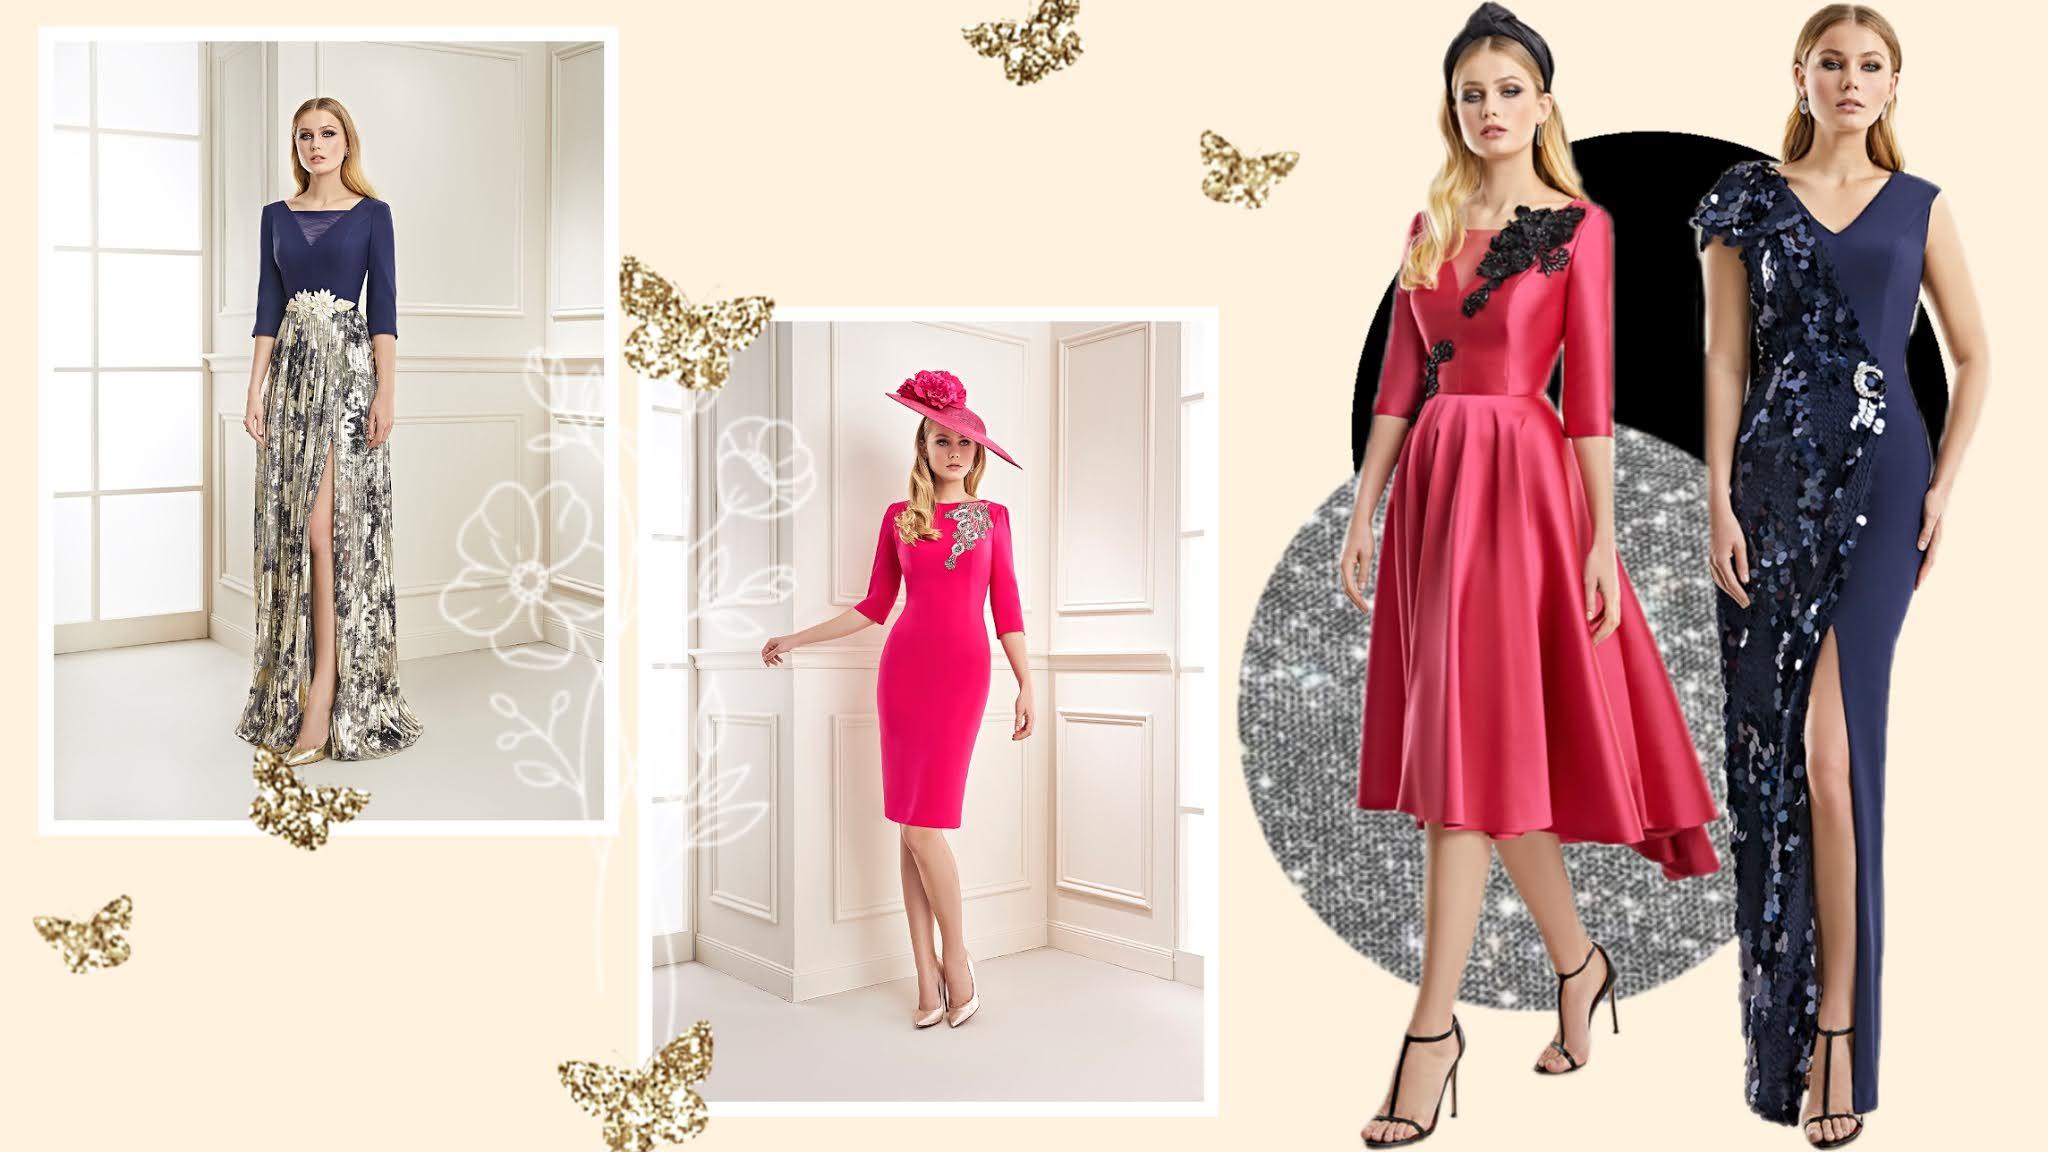 Vestidos de fiesta: Primavera Verano 2020